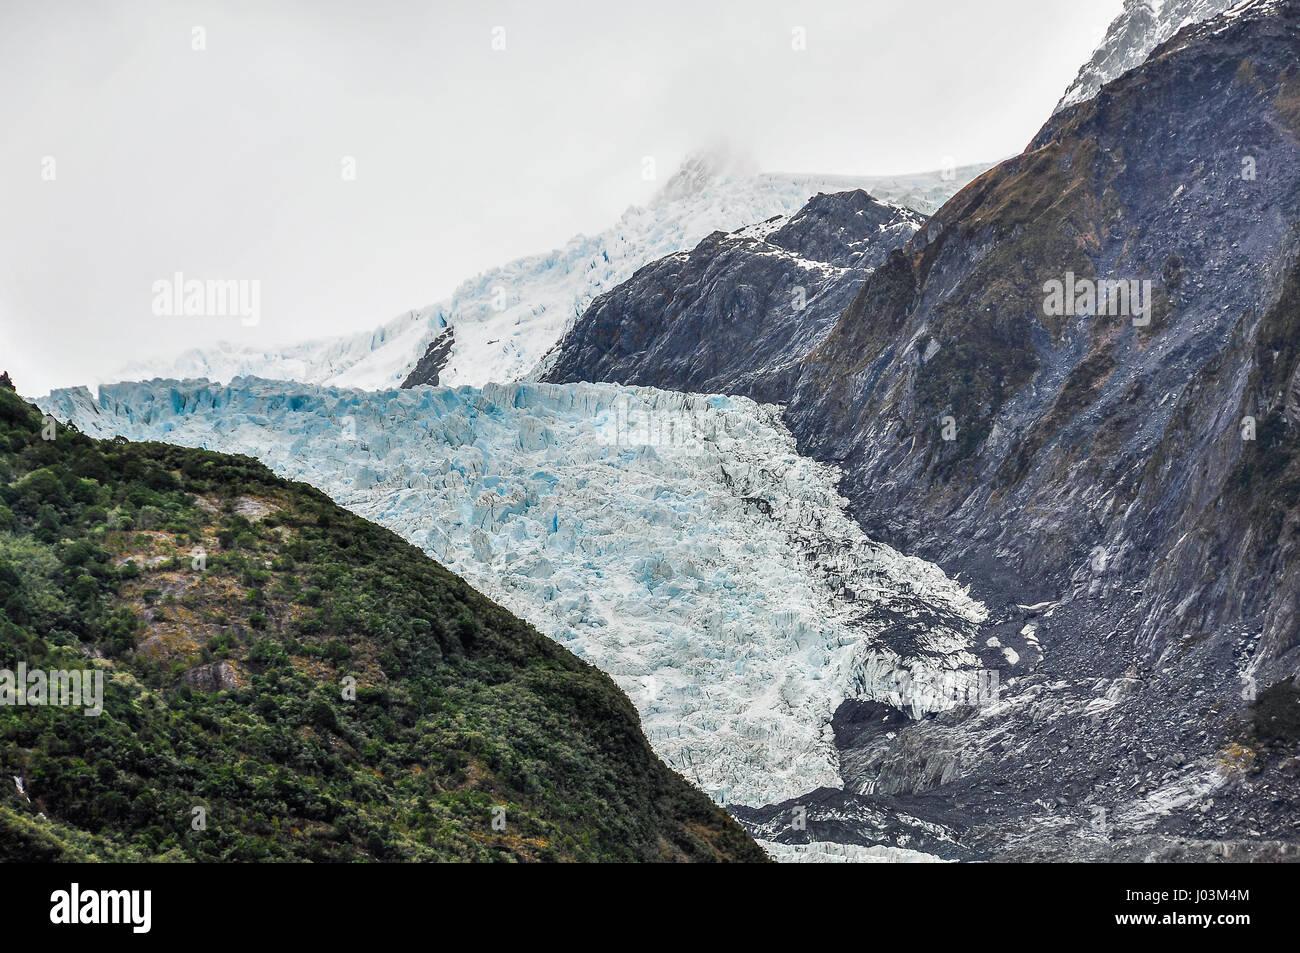 Franz Josef Glacier in New Zealand - Stock Image